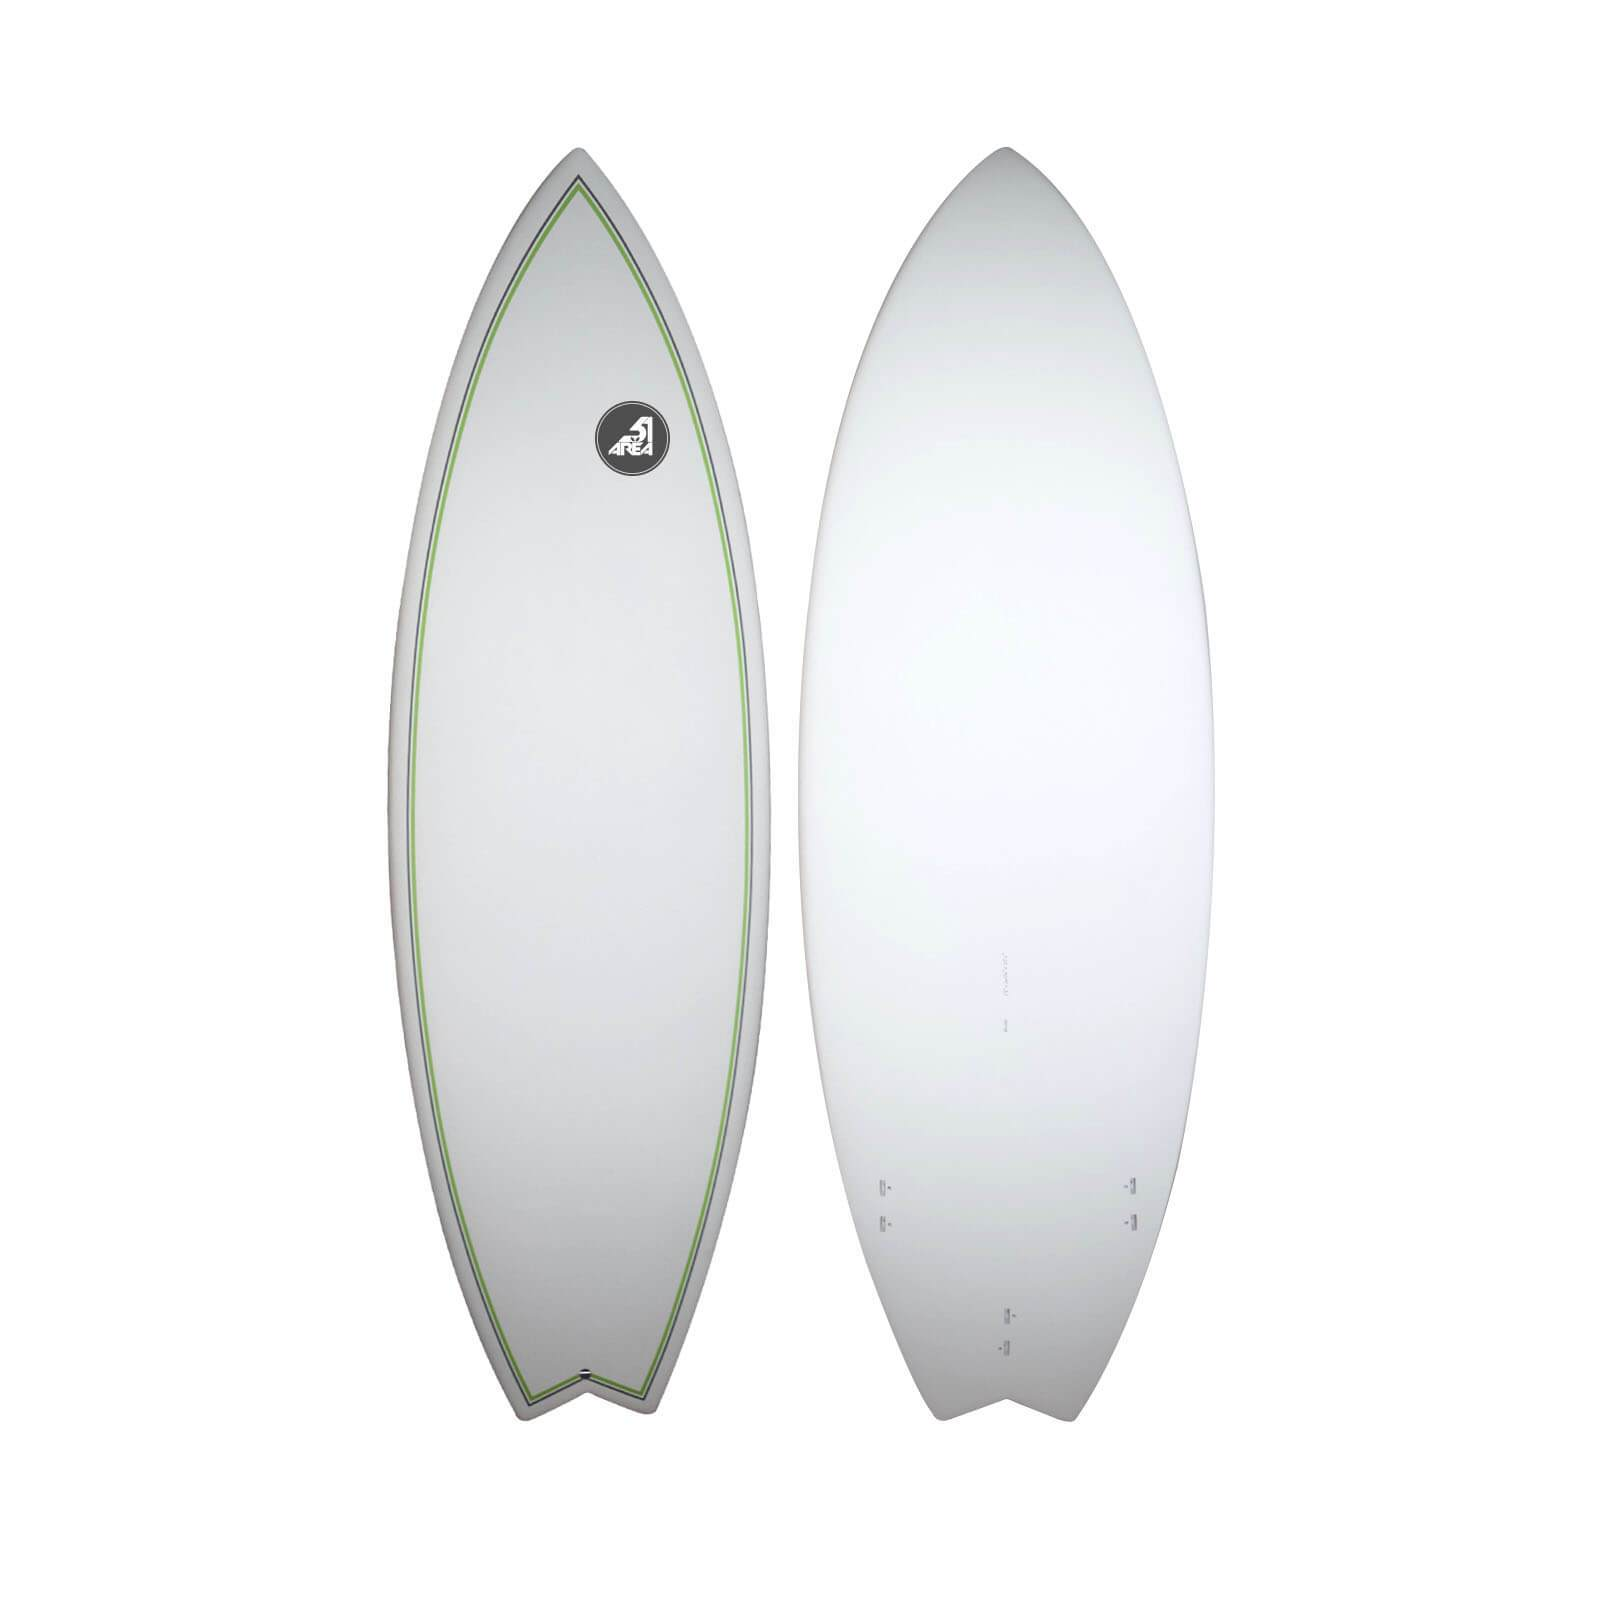 "AREA51 5'8x20 1/4""x2 1/2"" Fish Board Surfboard K0231"